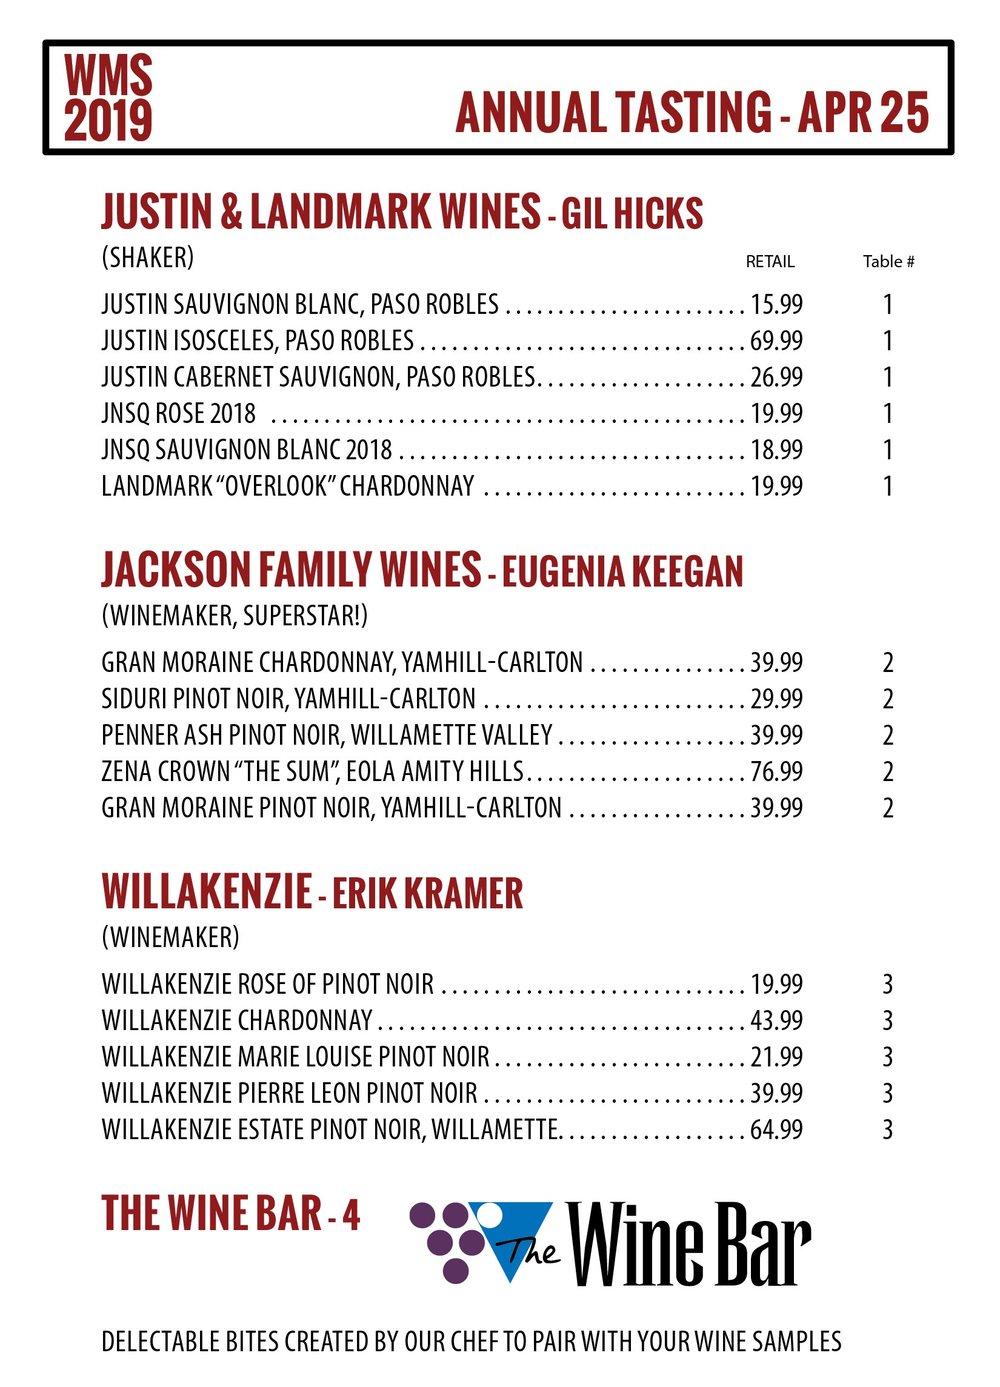 Winemakers+and+Shakers_Tasting+Guide_20193.jpg